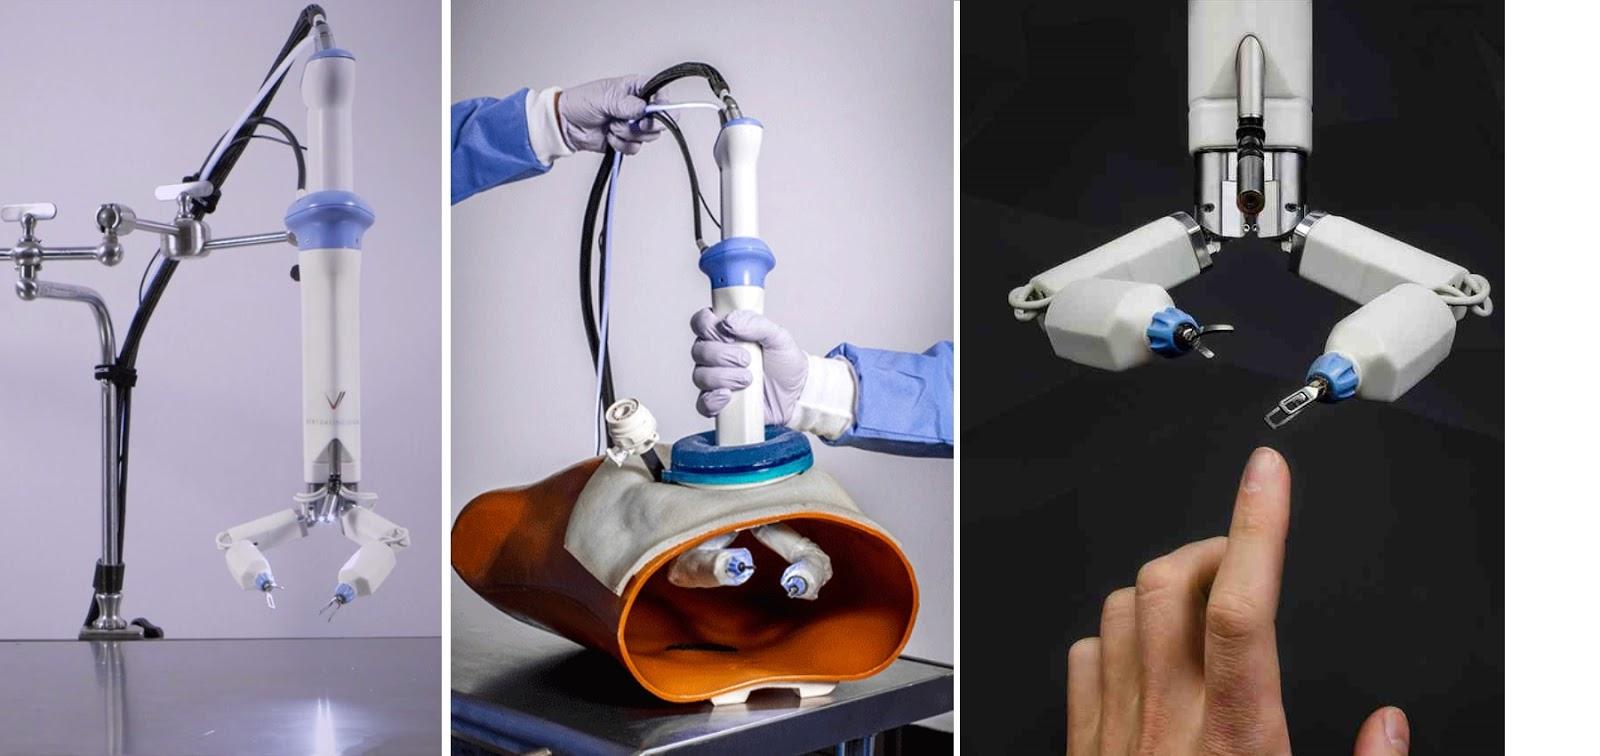 future of surgery